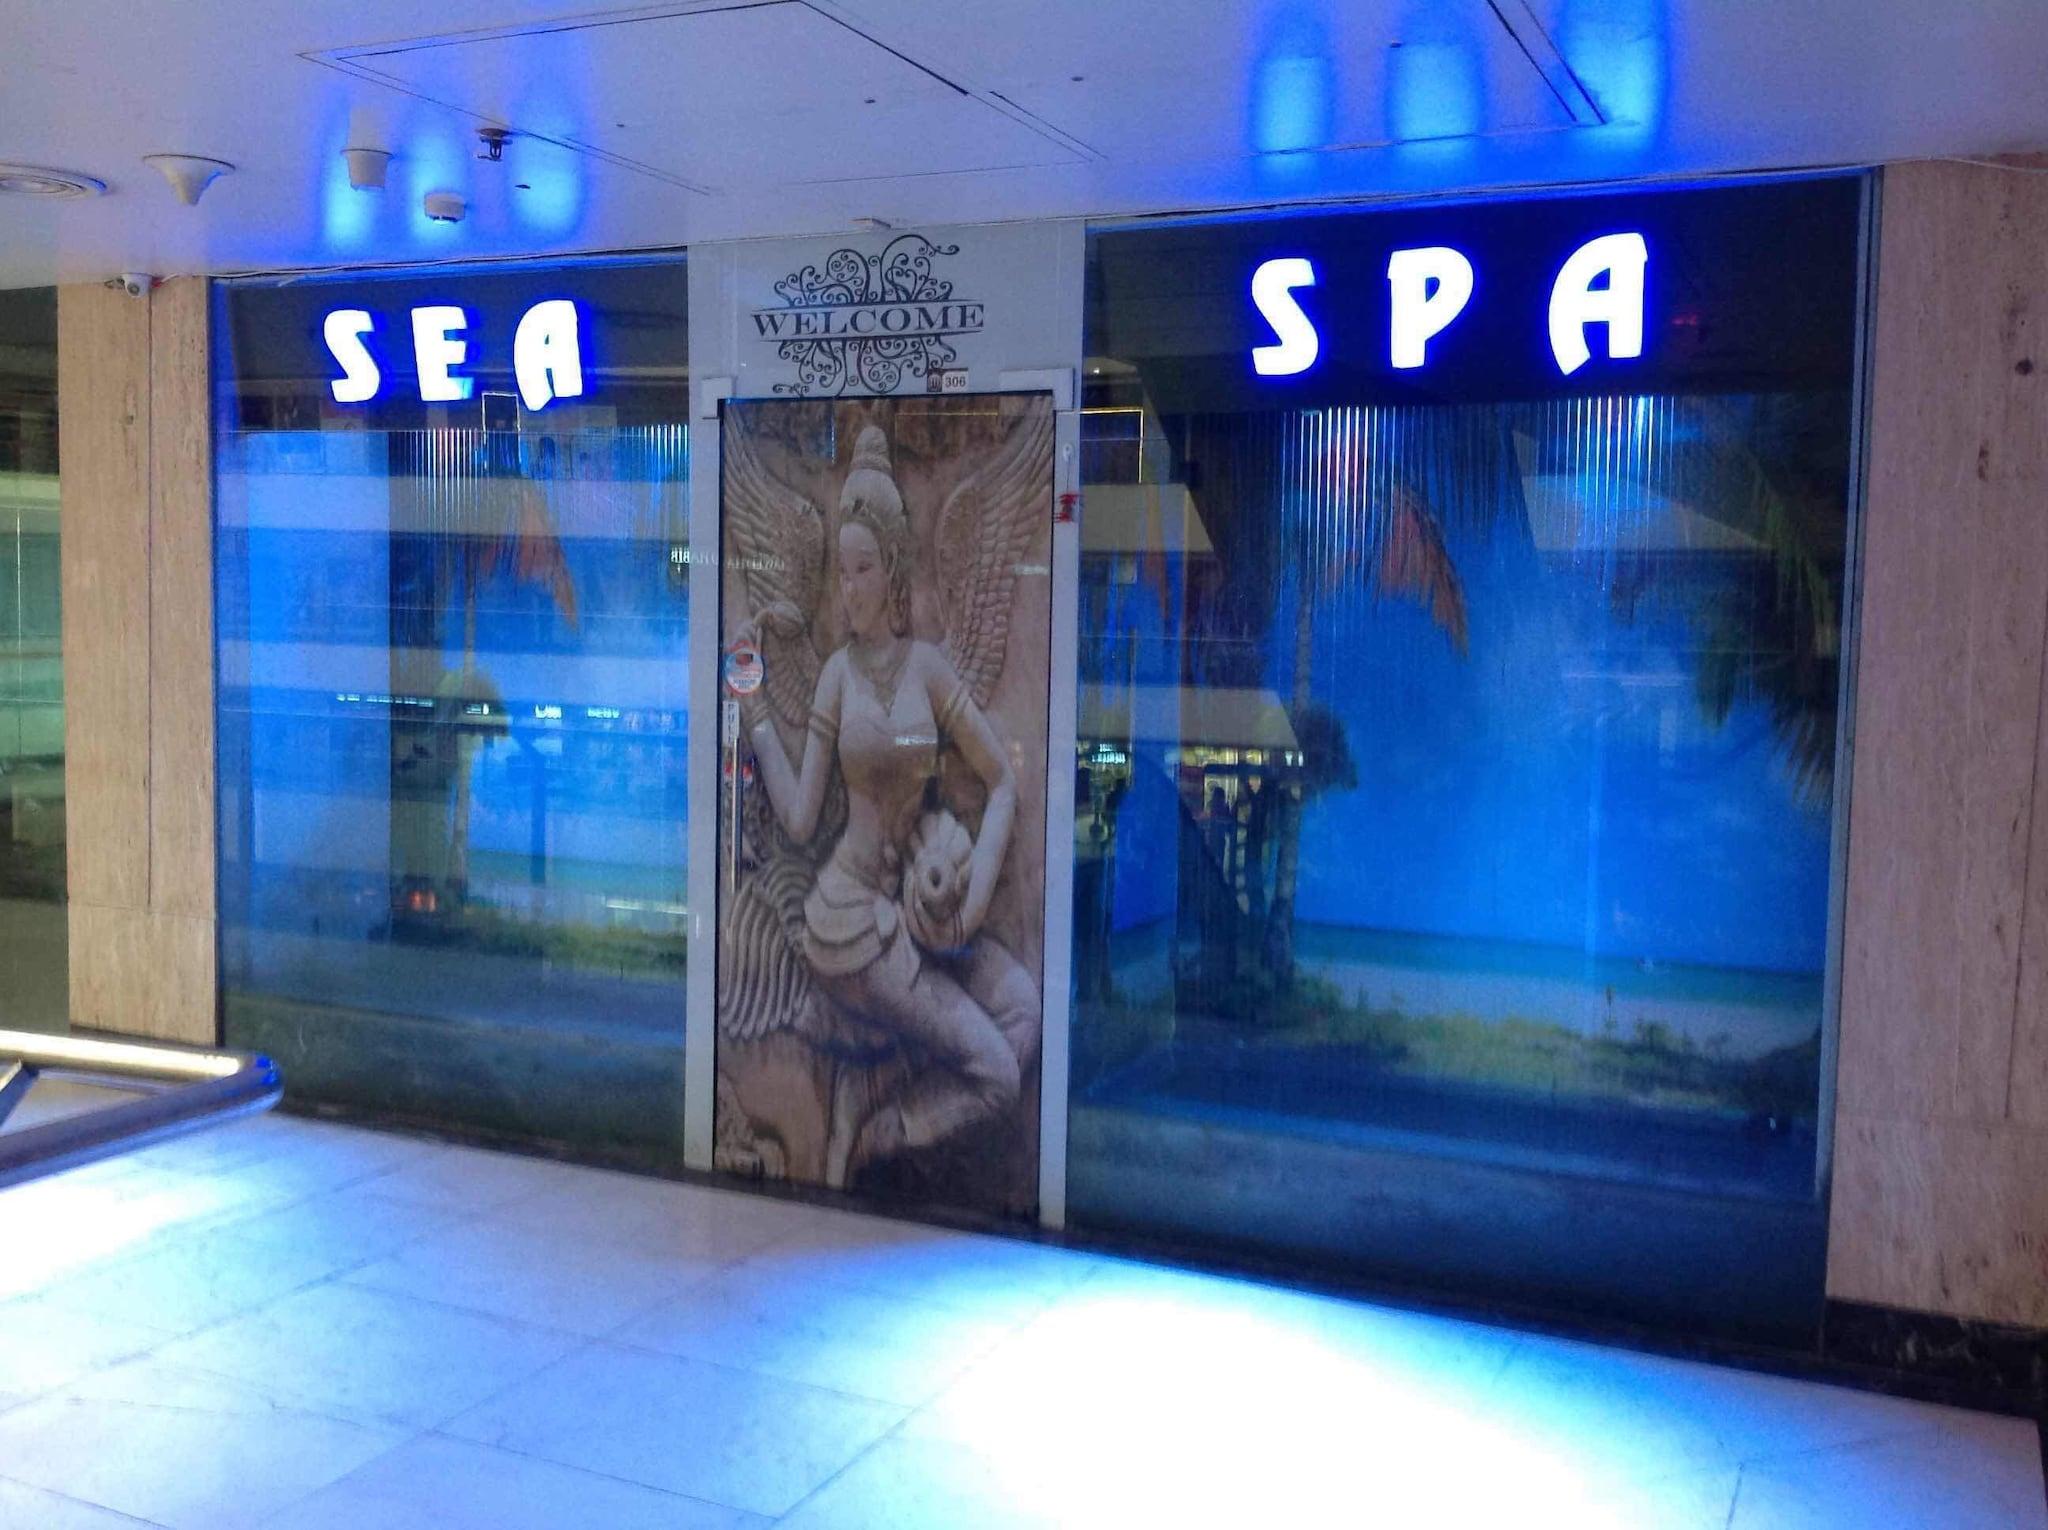 24 Hours Body Massage Centres in Delhi - Body Massage Parlours